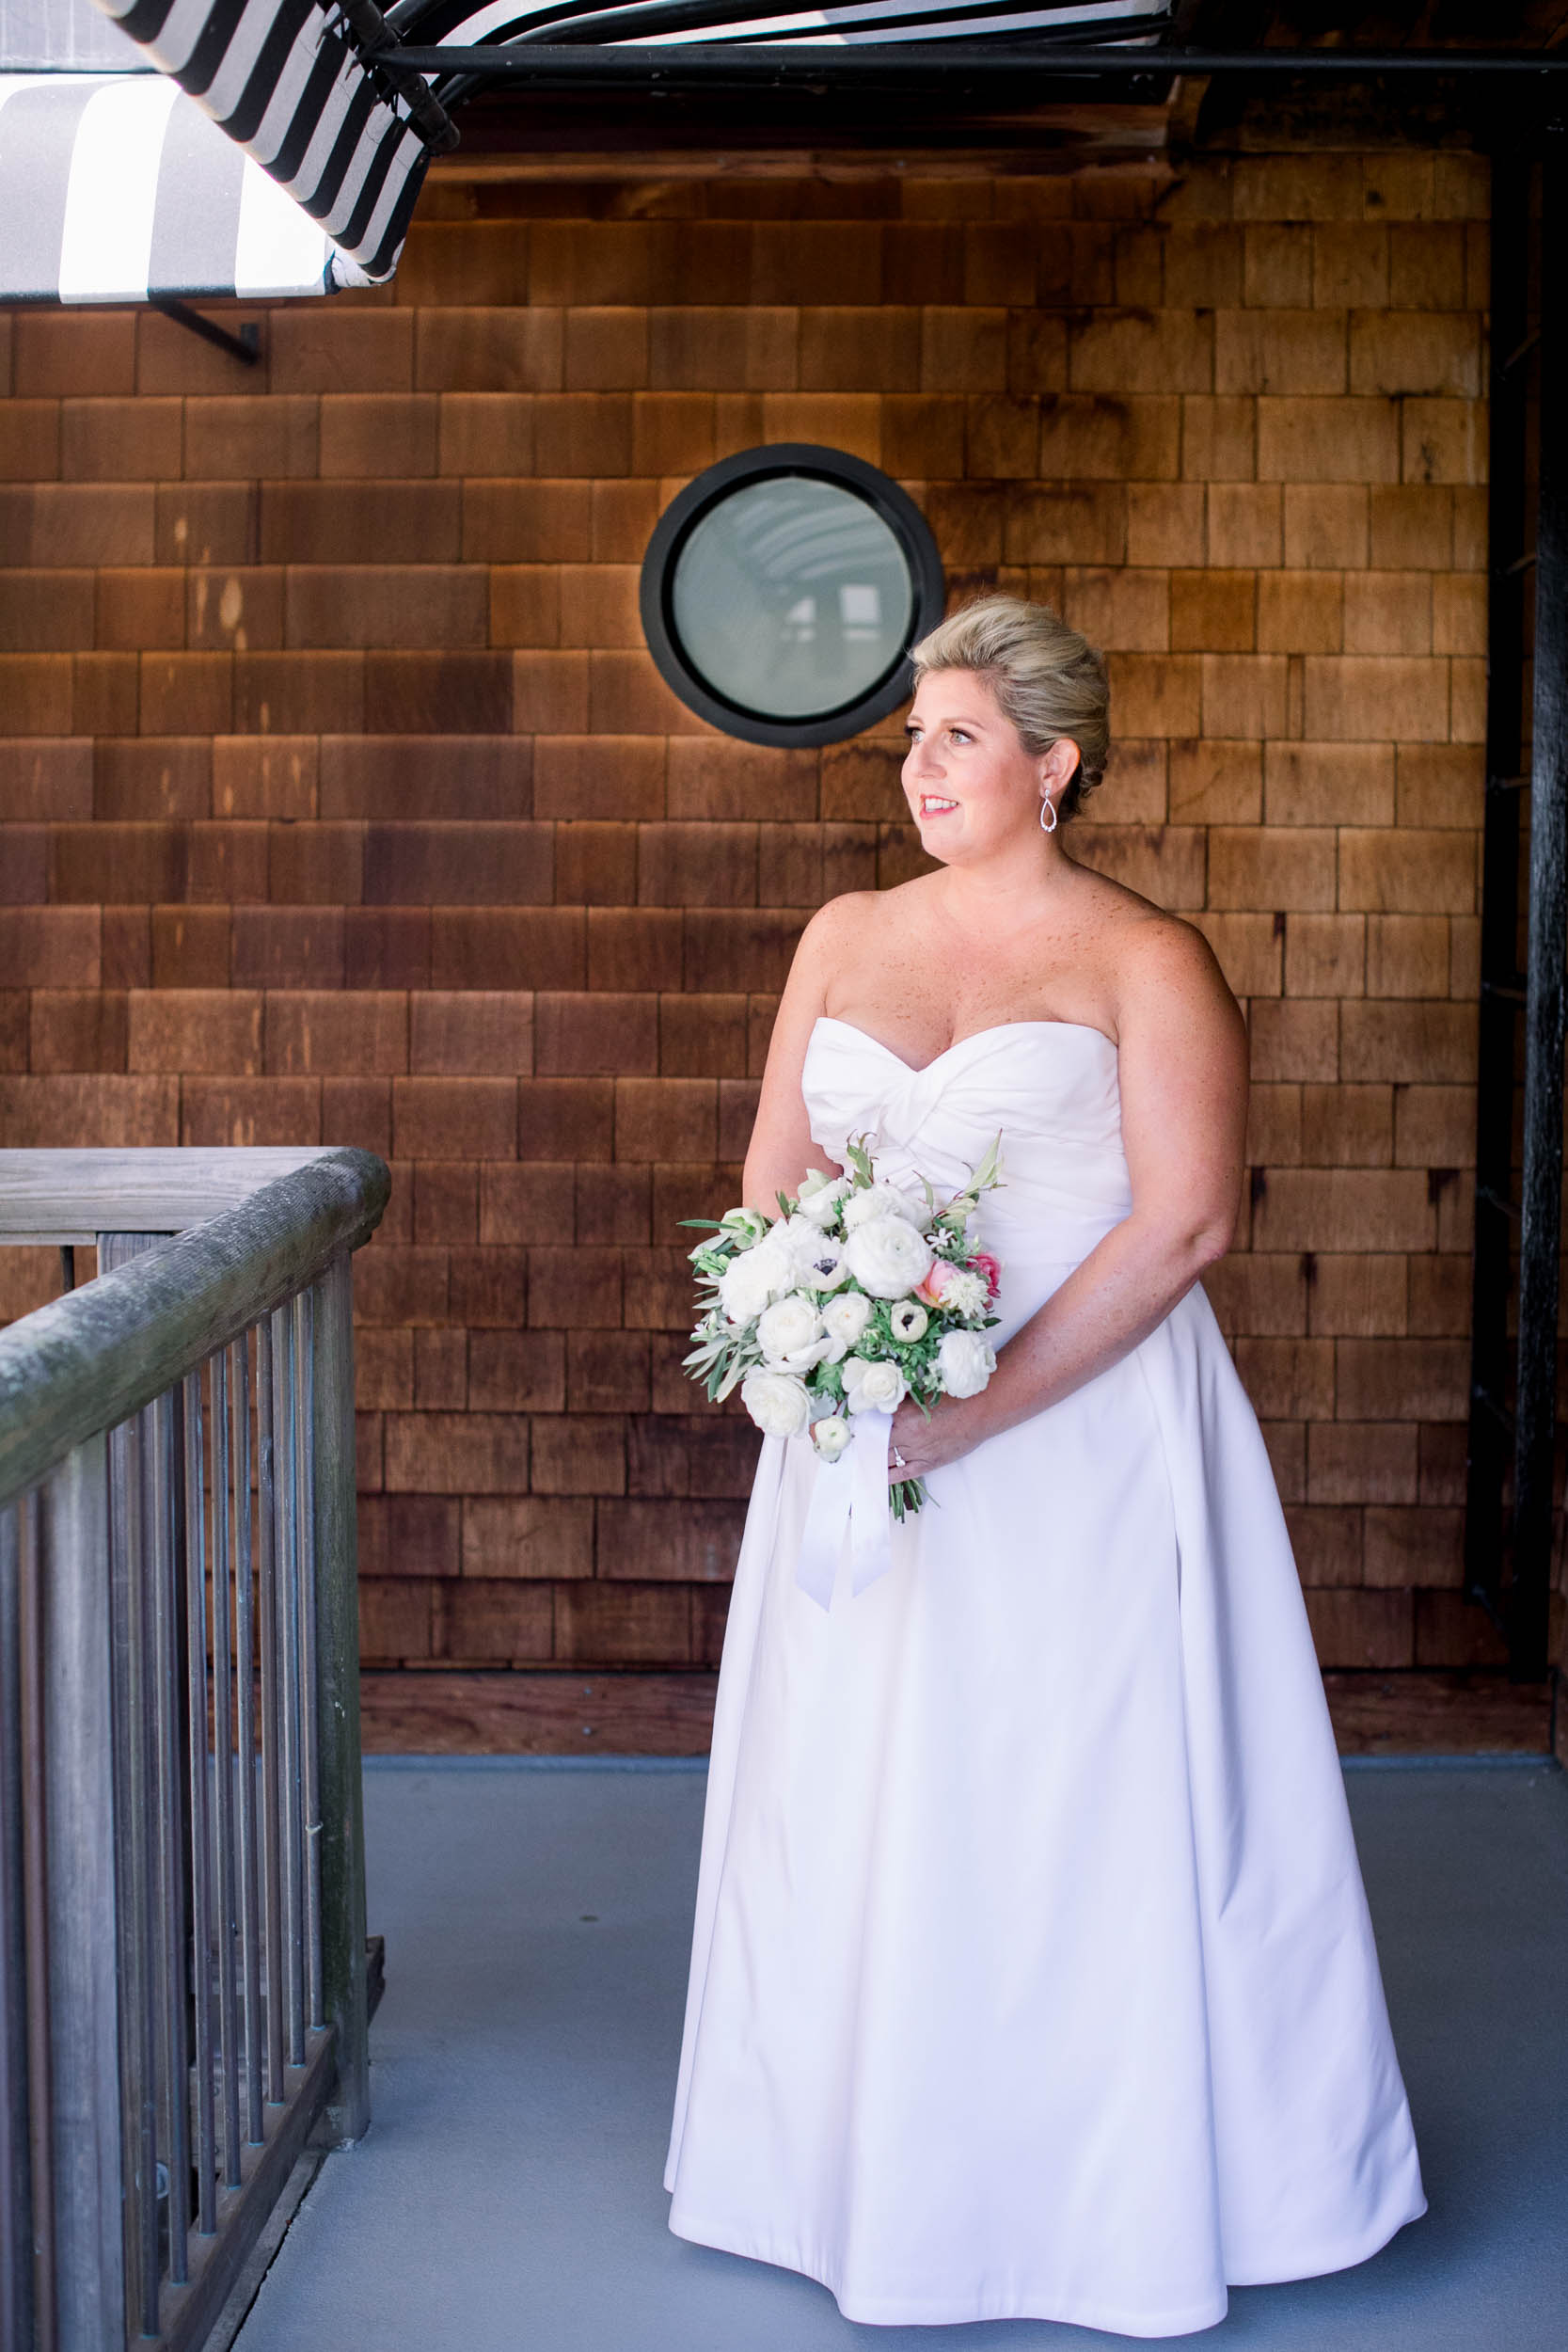 092218ER125_Sausalito Yacht Club Wedding_Buena Lane Photography.jpg